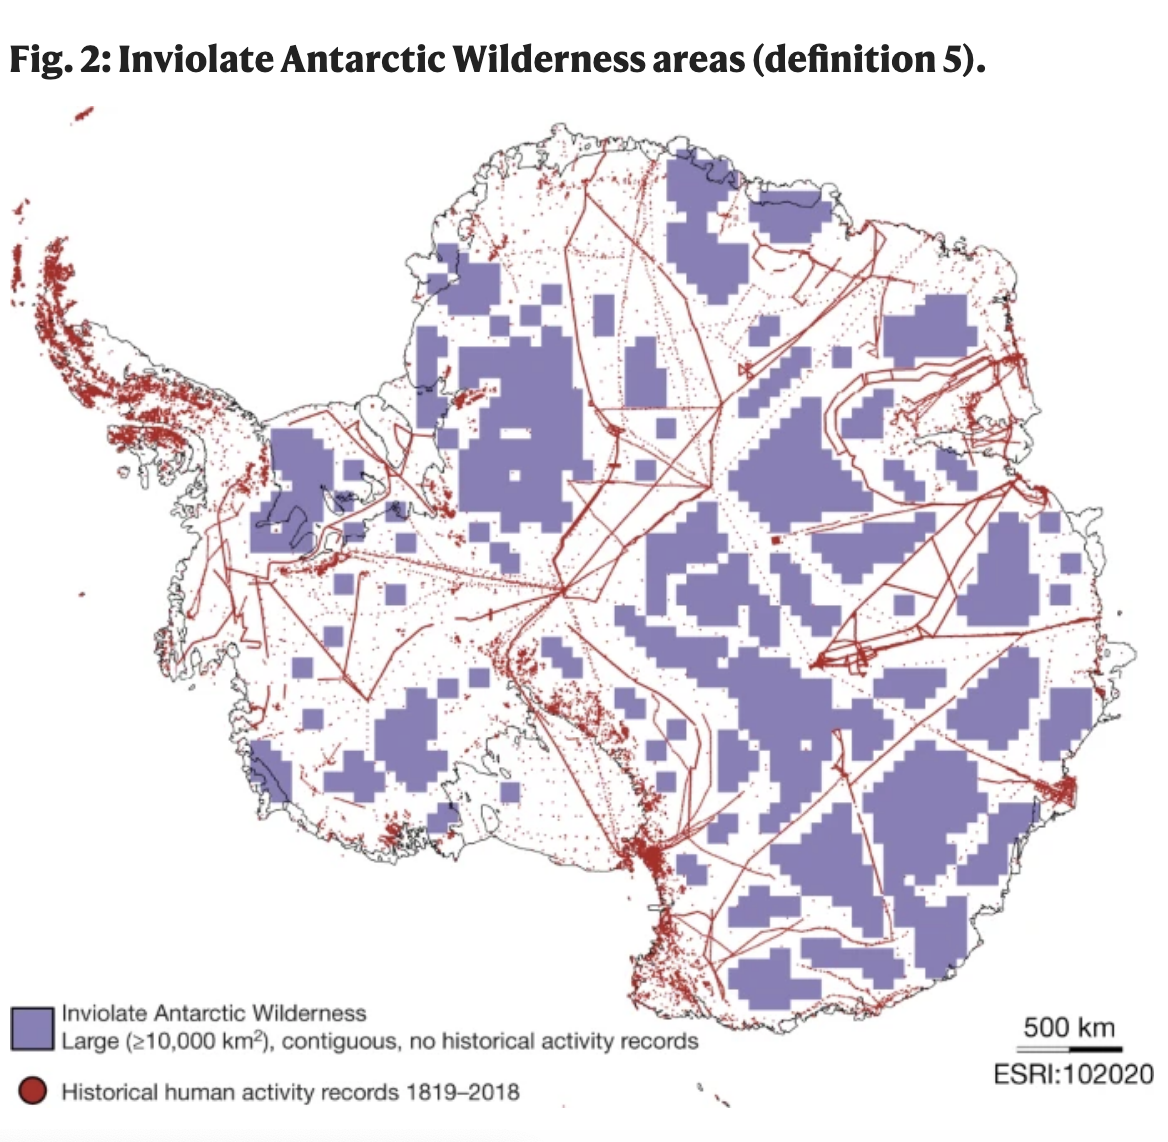 antarcticawilderness